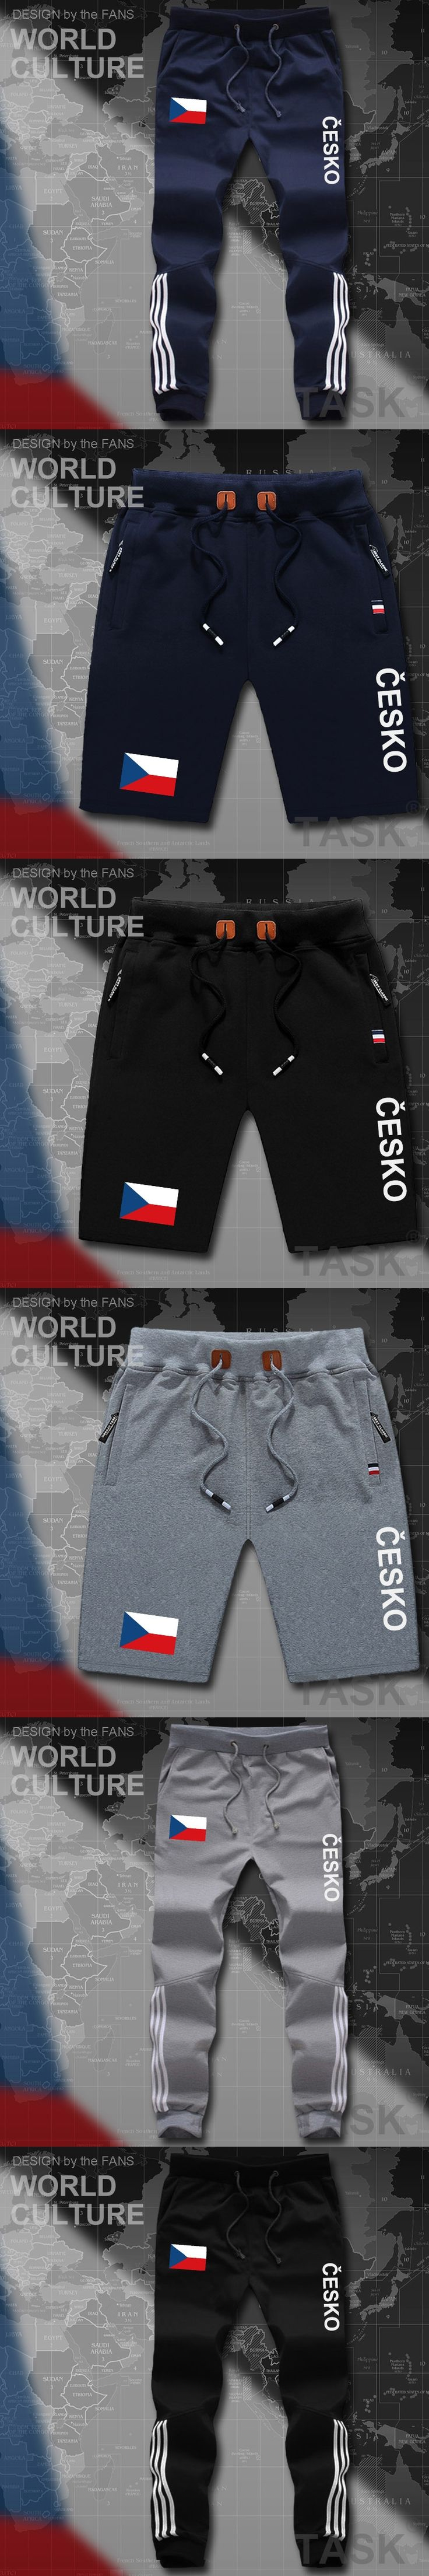 Czech Republic Czechia mens pants joggers jumpsuit sweatpants track cargo sweat fitness casual nation country flag 2017 new CZE